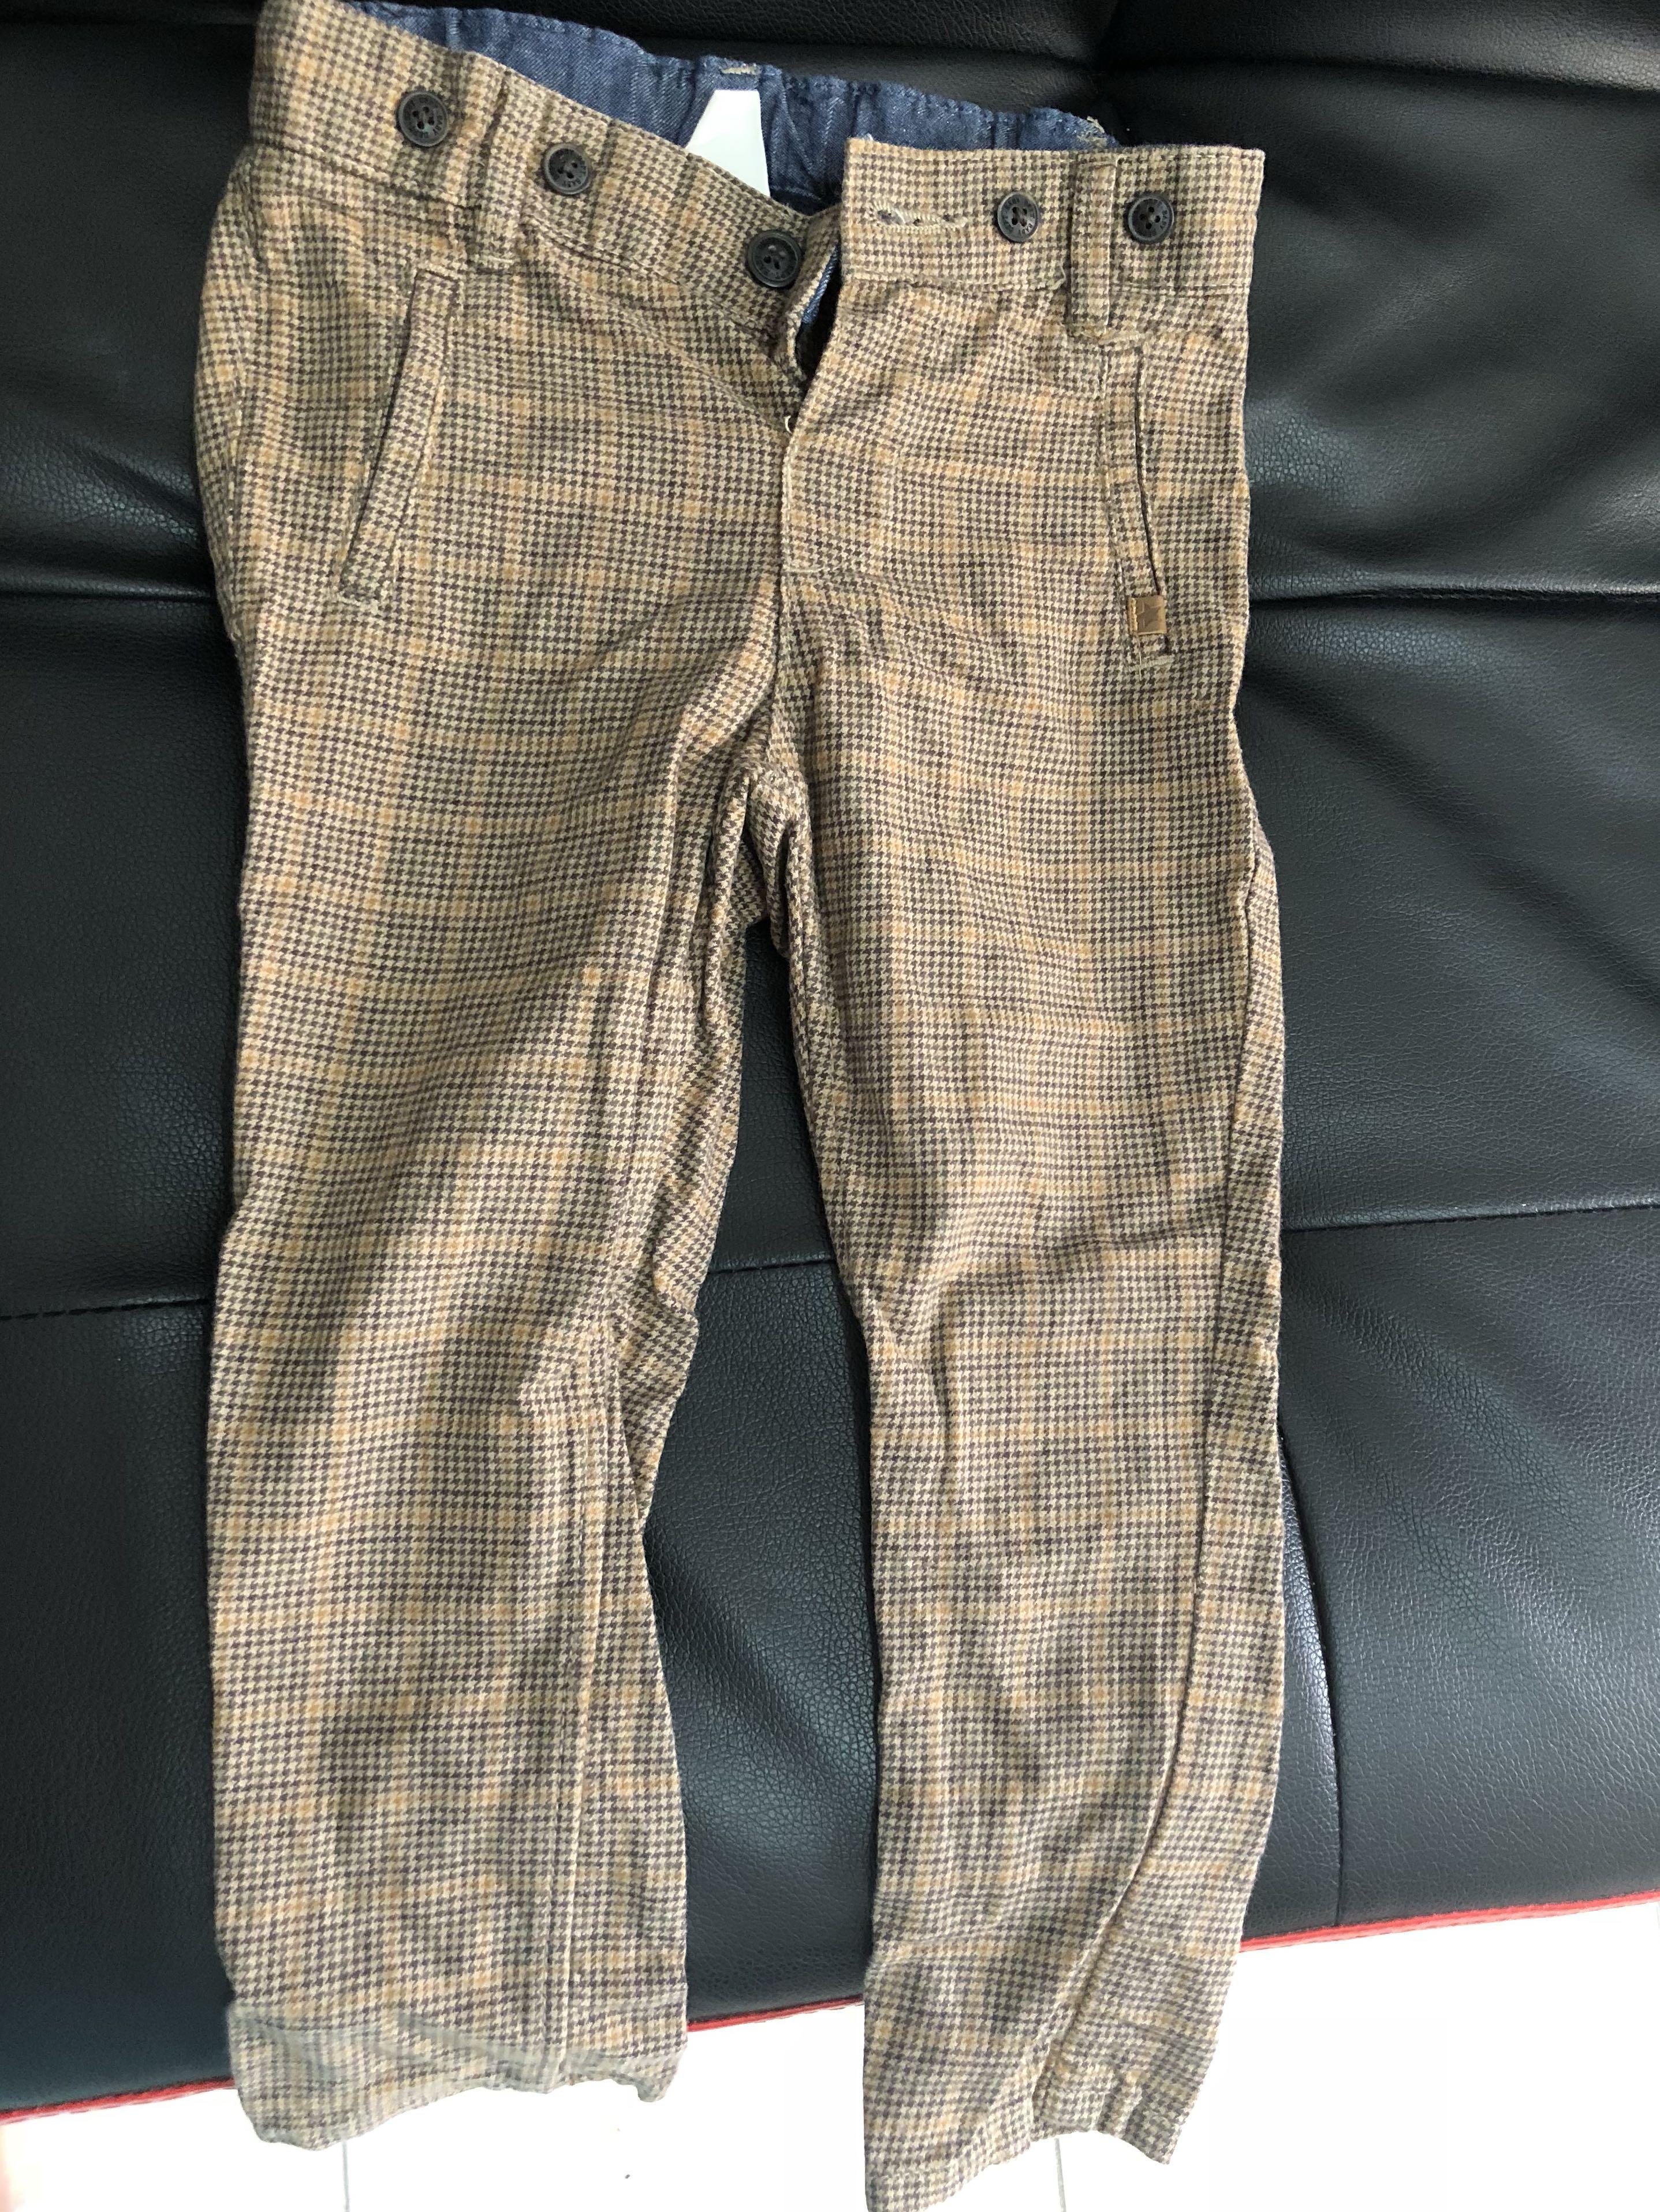 181ee45675 H&M Long Pants, Babies & Kids, Babies Apparel on Carousell